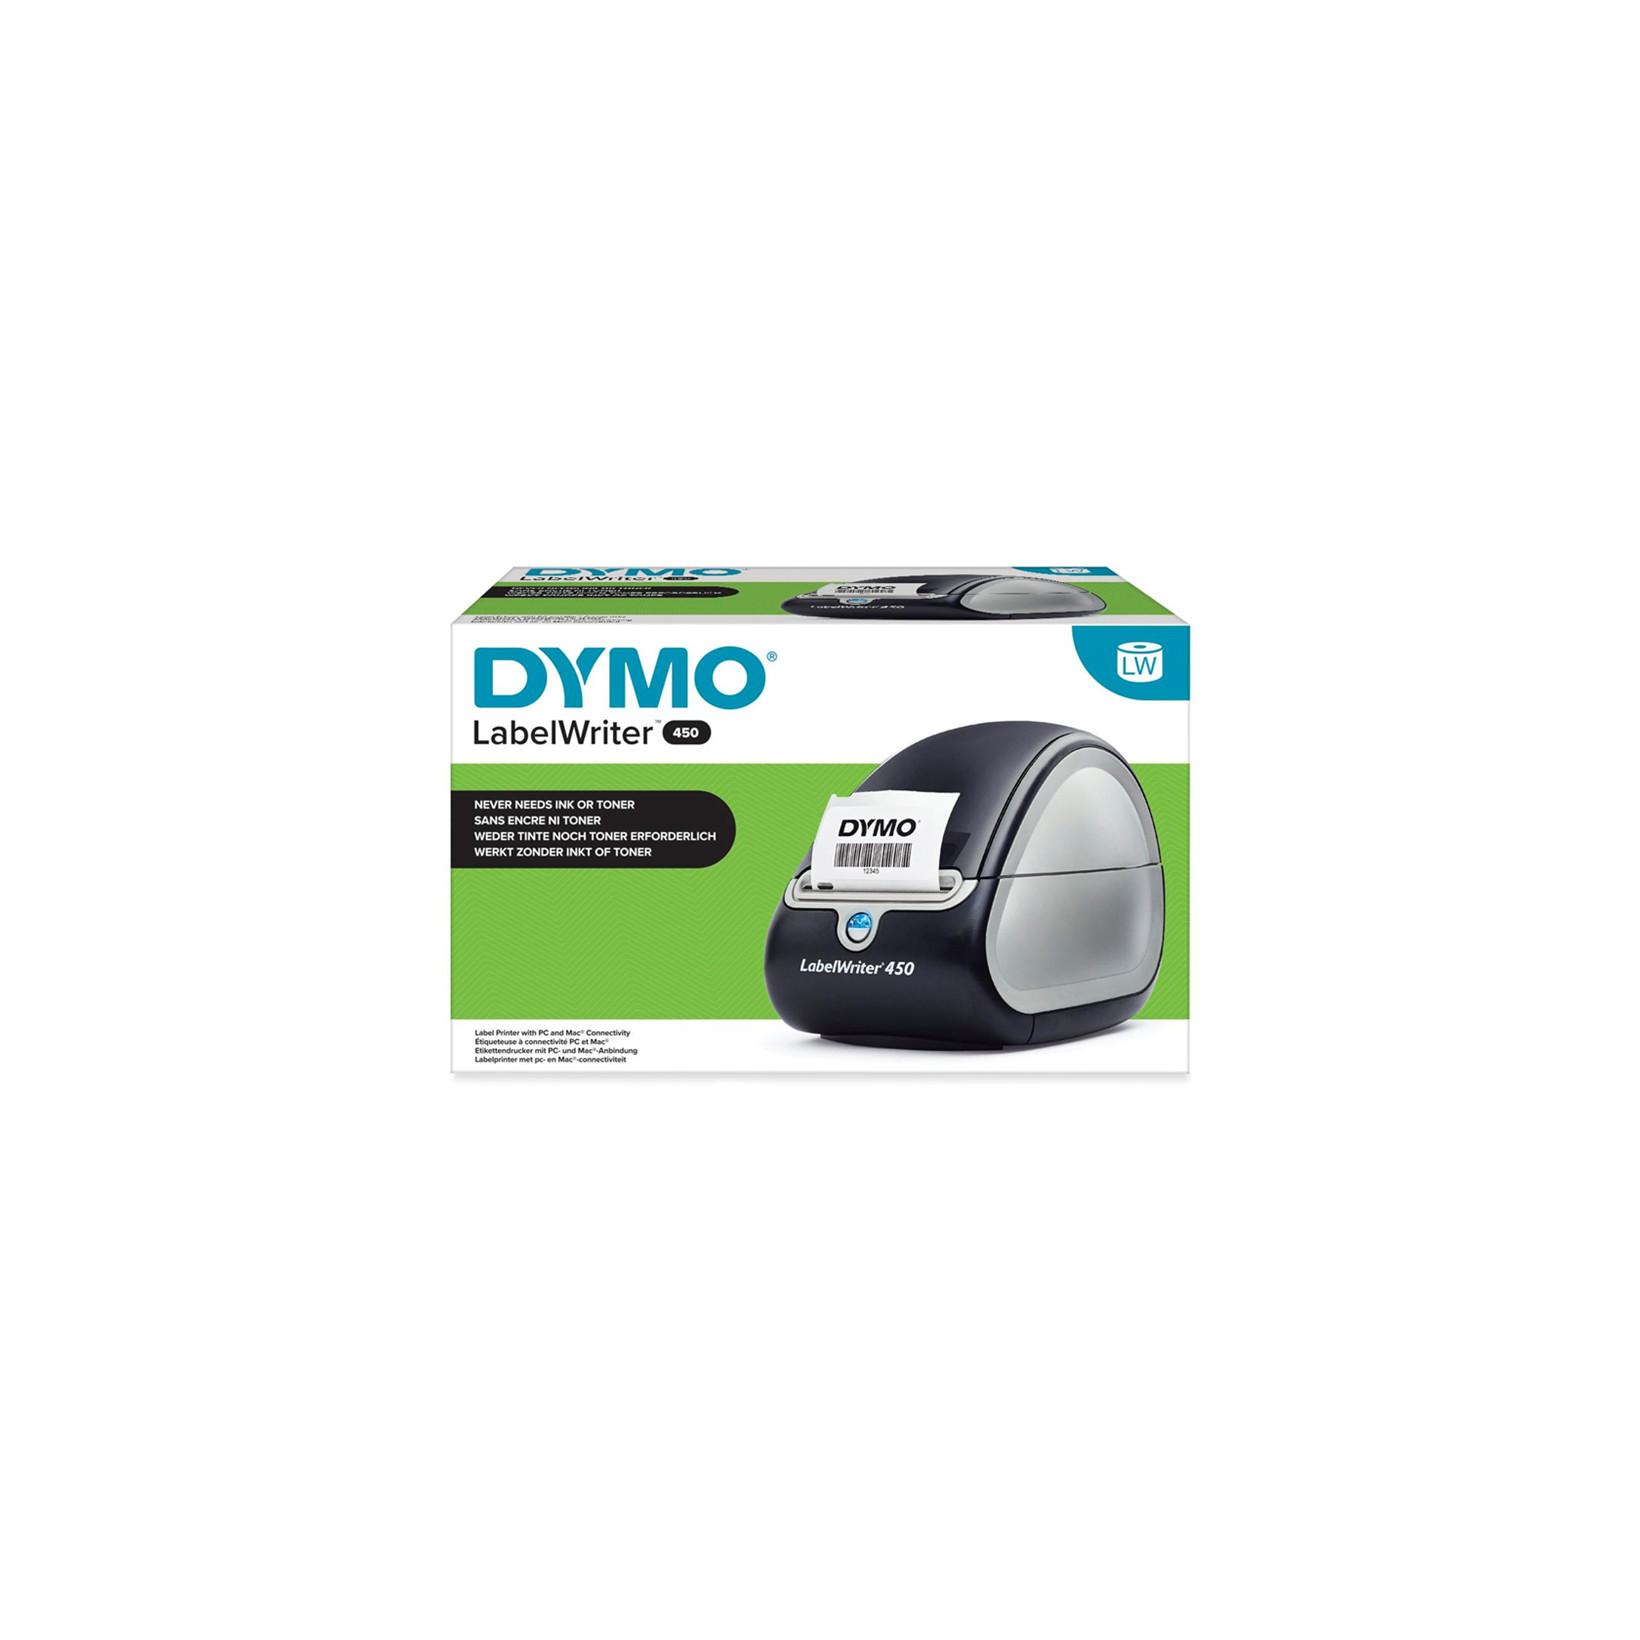 Dymo LabelWriter 450 black/silver